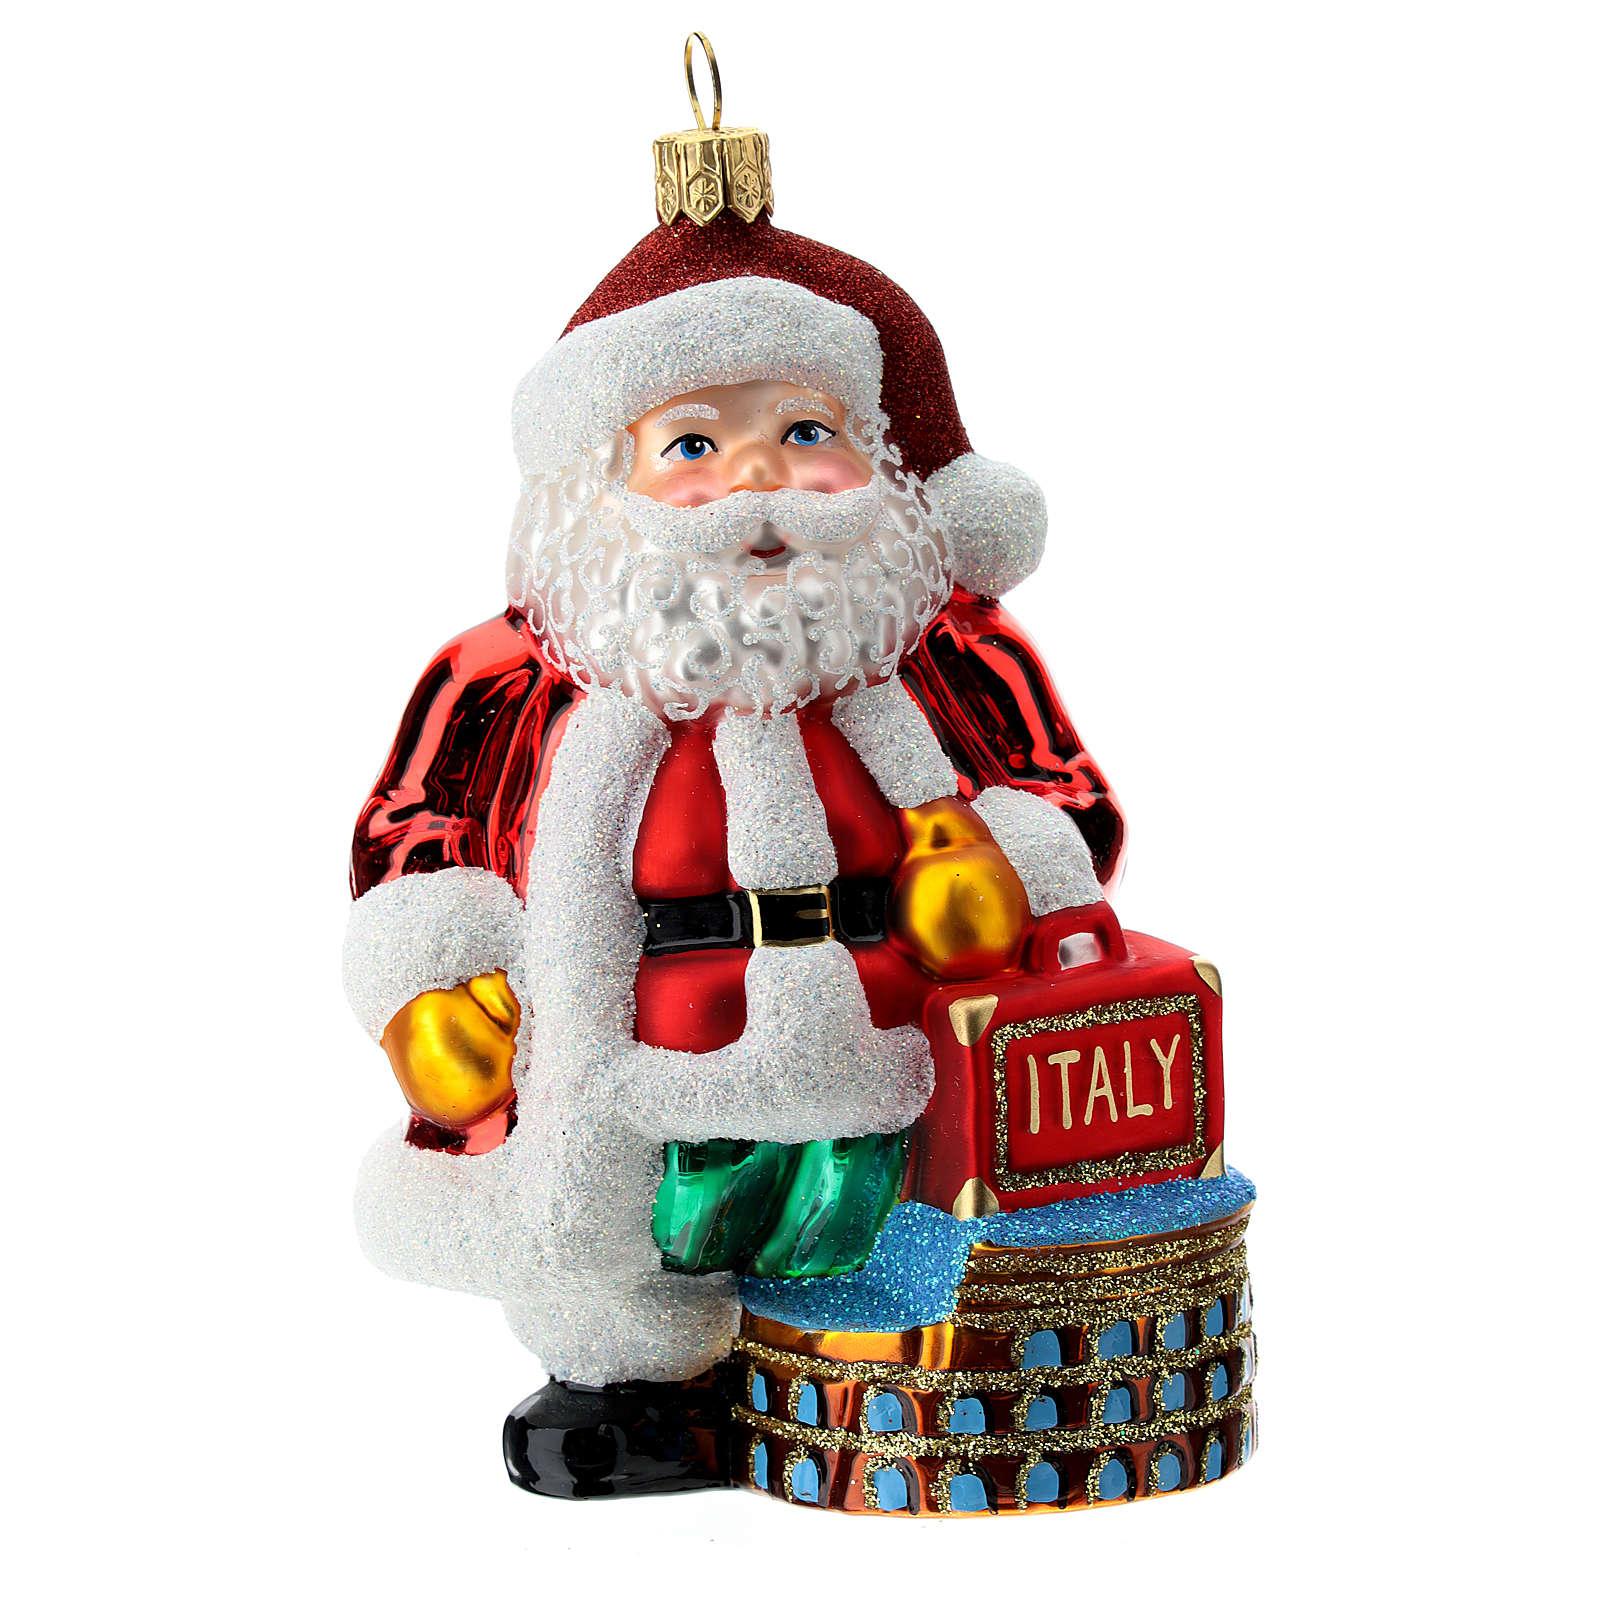 Italian Santa Claus blown glass Christmas ornament 4